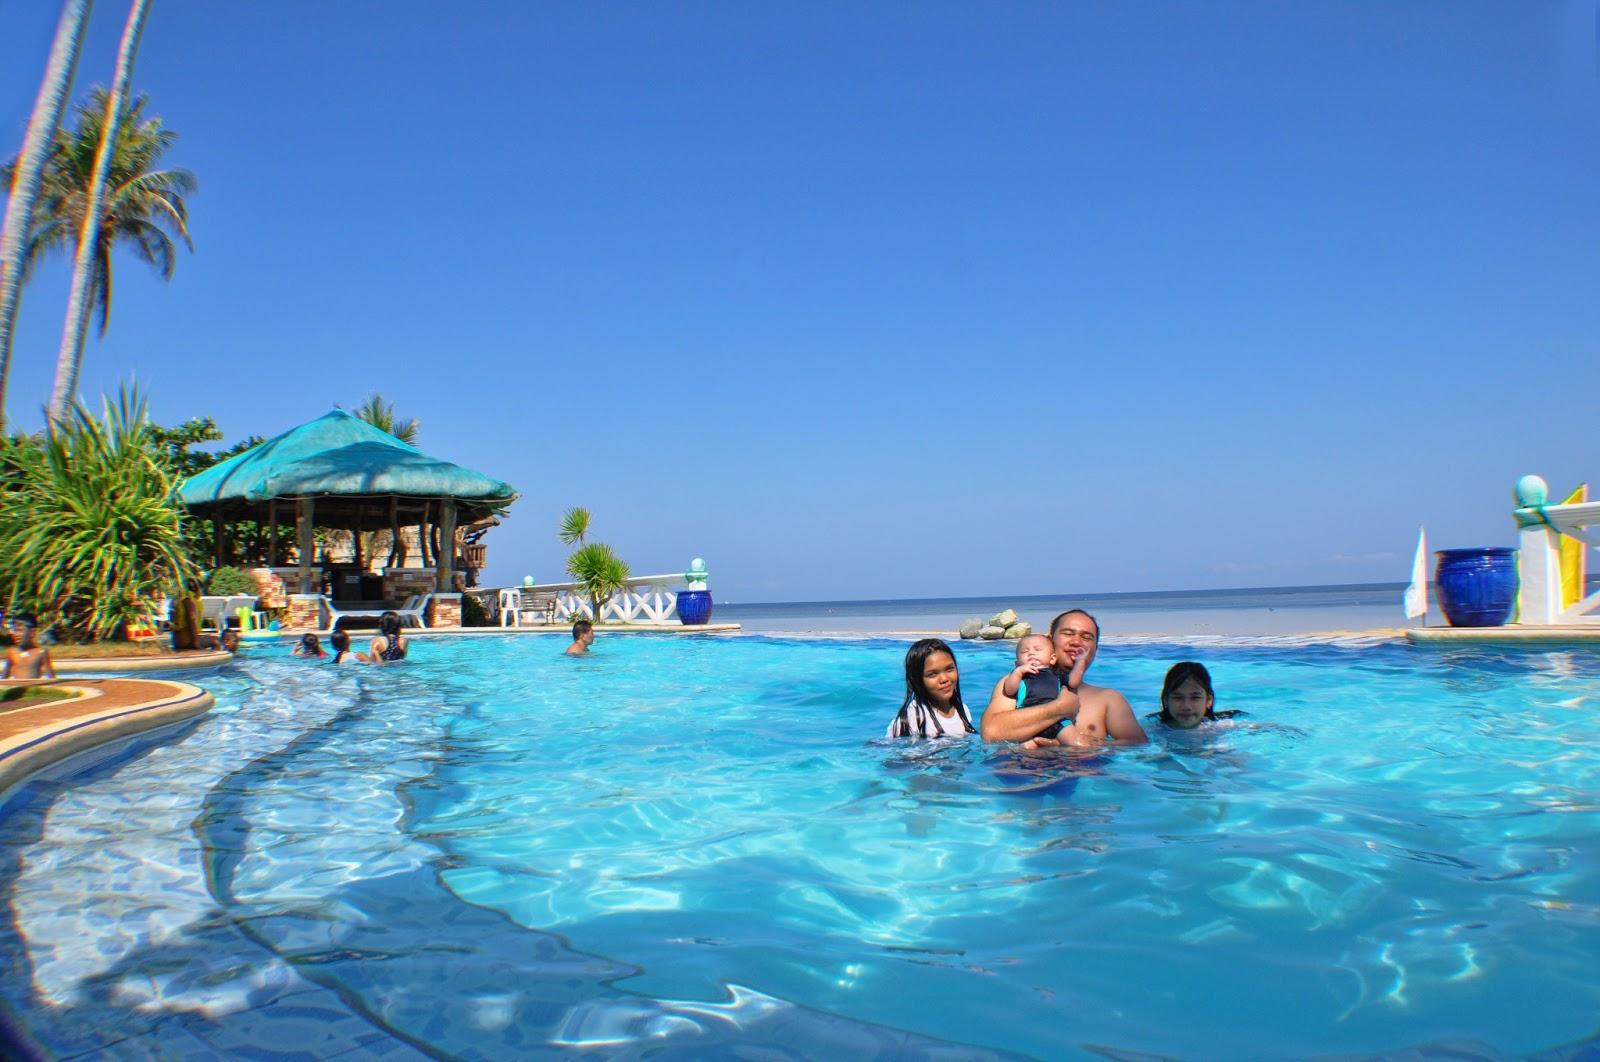 punta riviera resort bolinao pangasinan tasty destination food travel